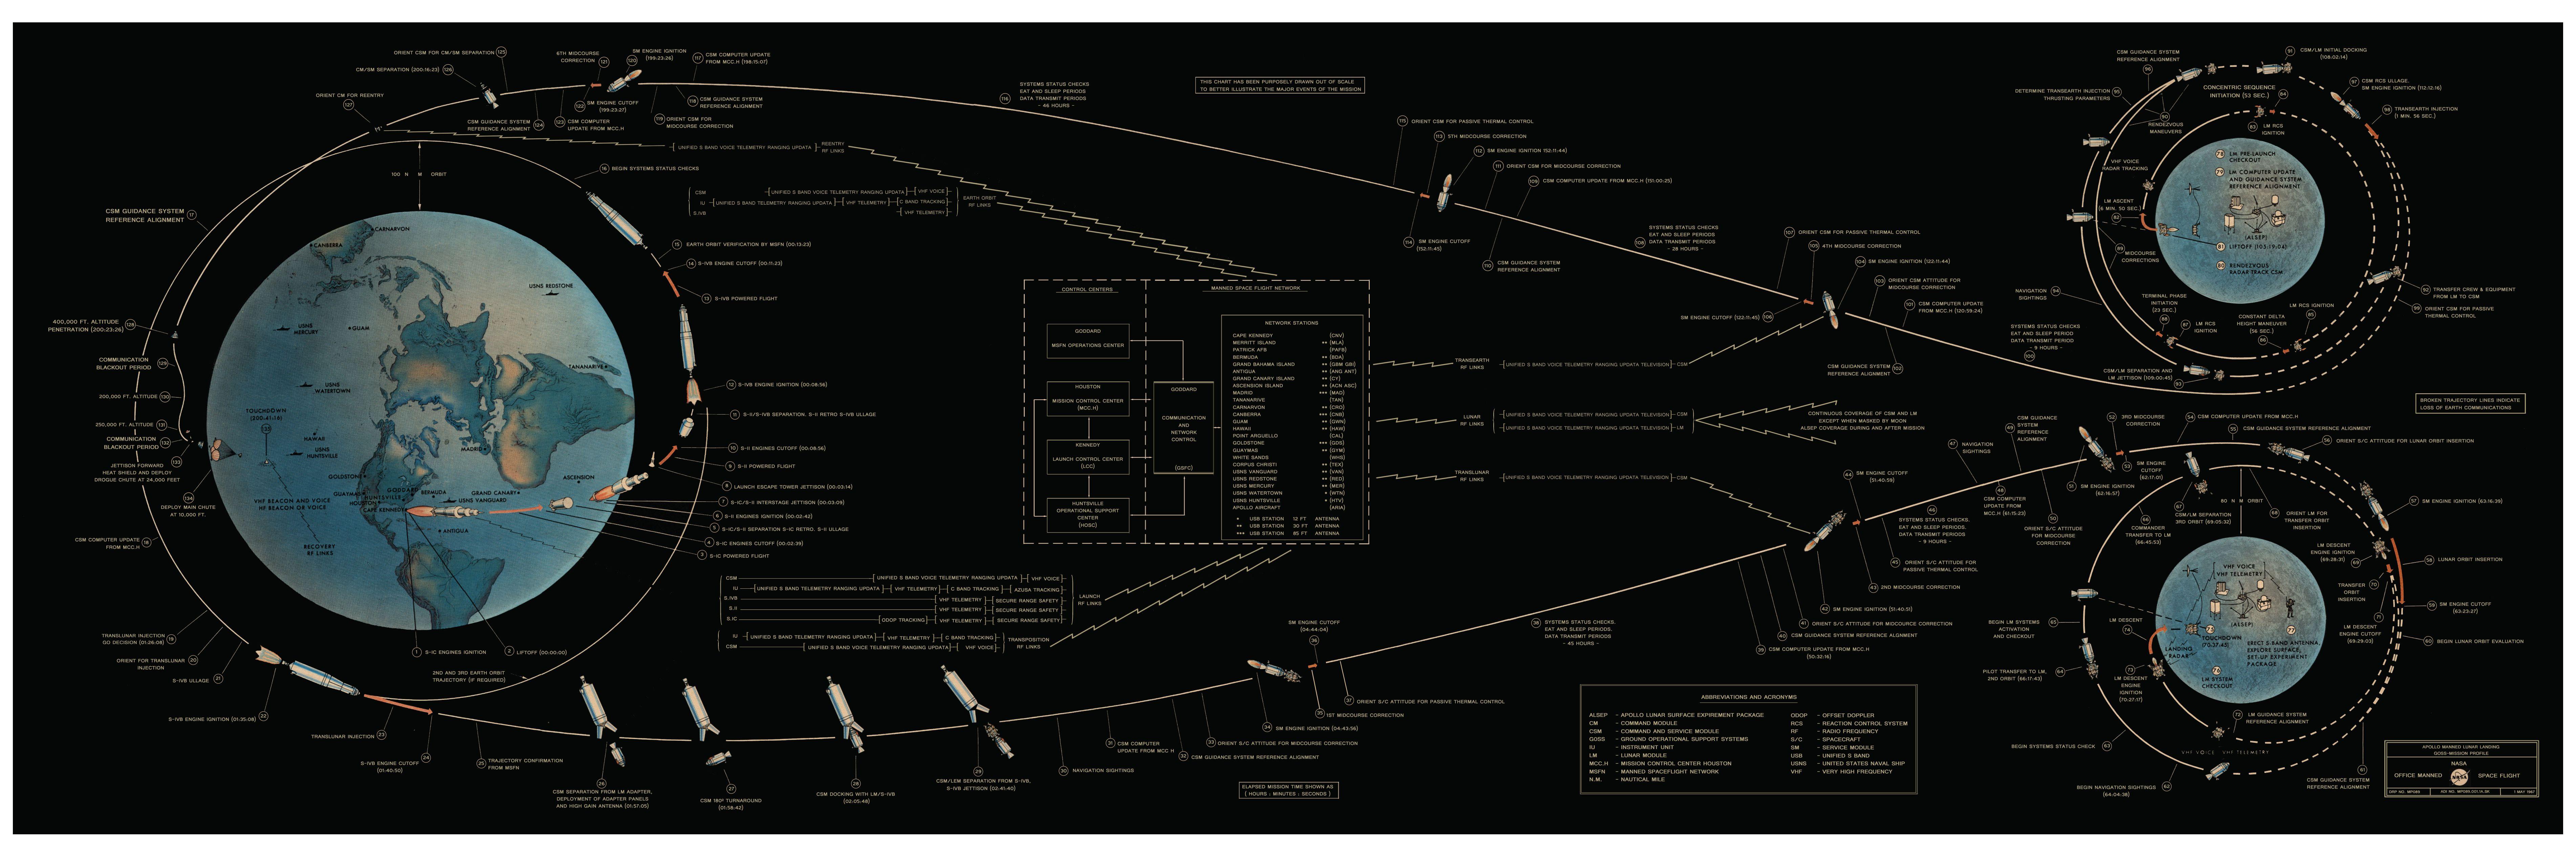 apollo 11 space exploration - photo #43